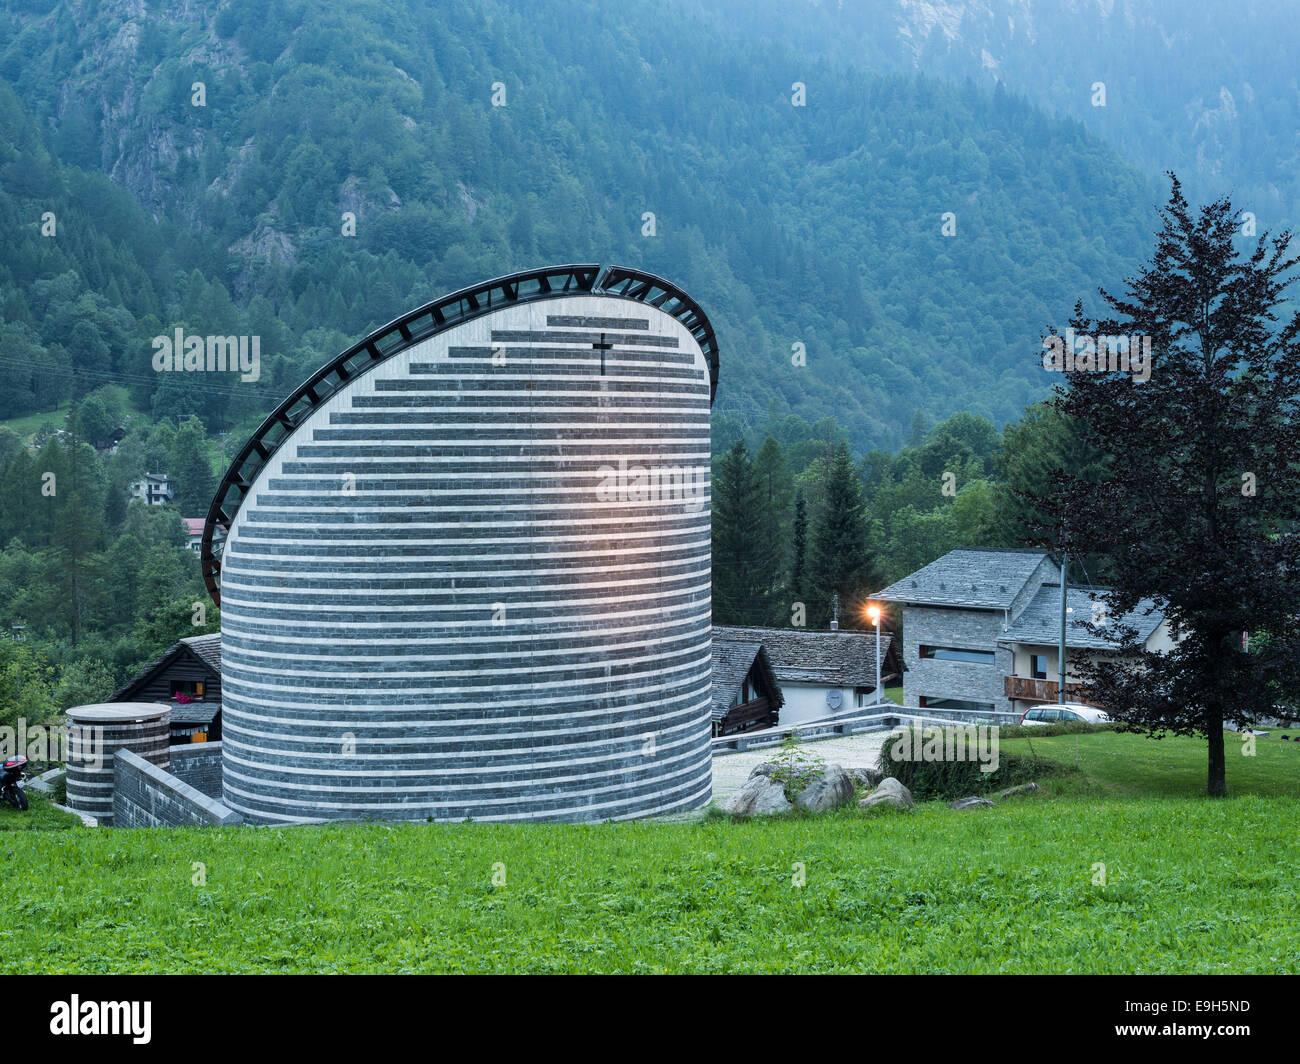 Pfarrei Kirche San Giovanni Battista, moderne Architektur von Mario Botta, Mogno, Lavizzara, Kanton Tessin, Schweiz Stockfoto